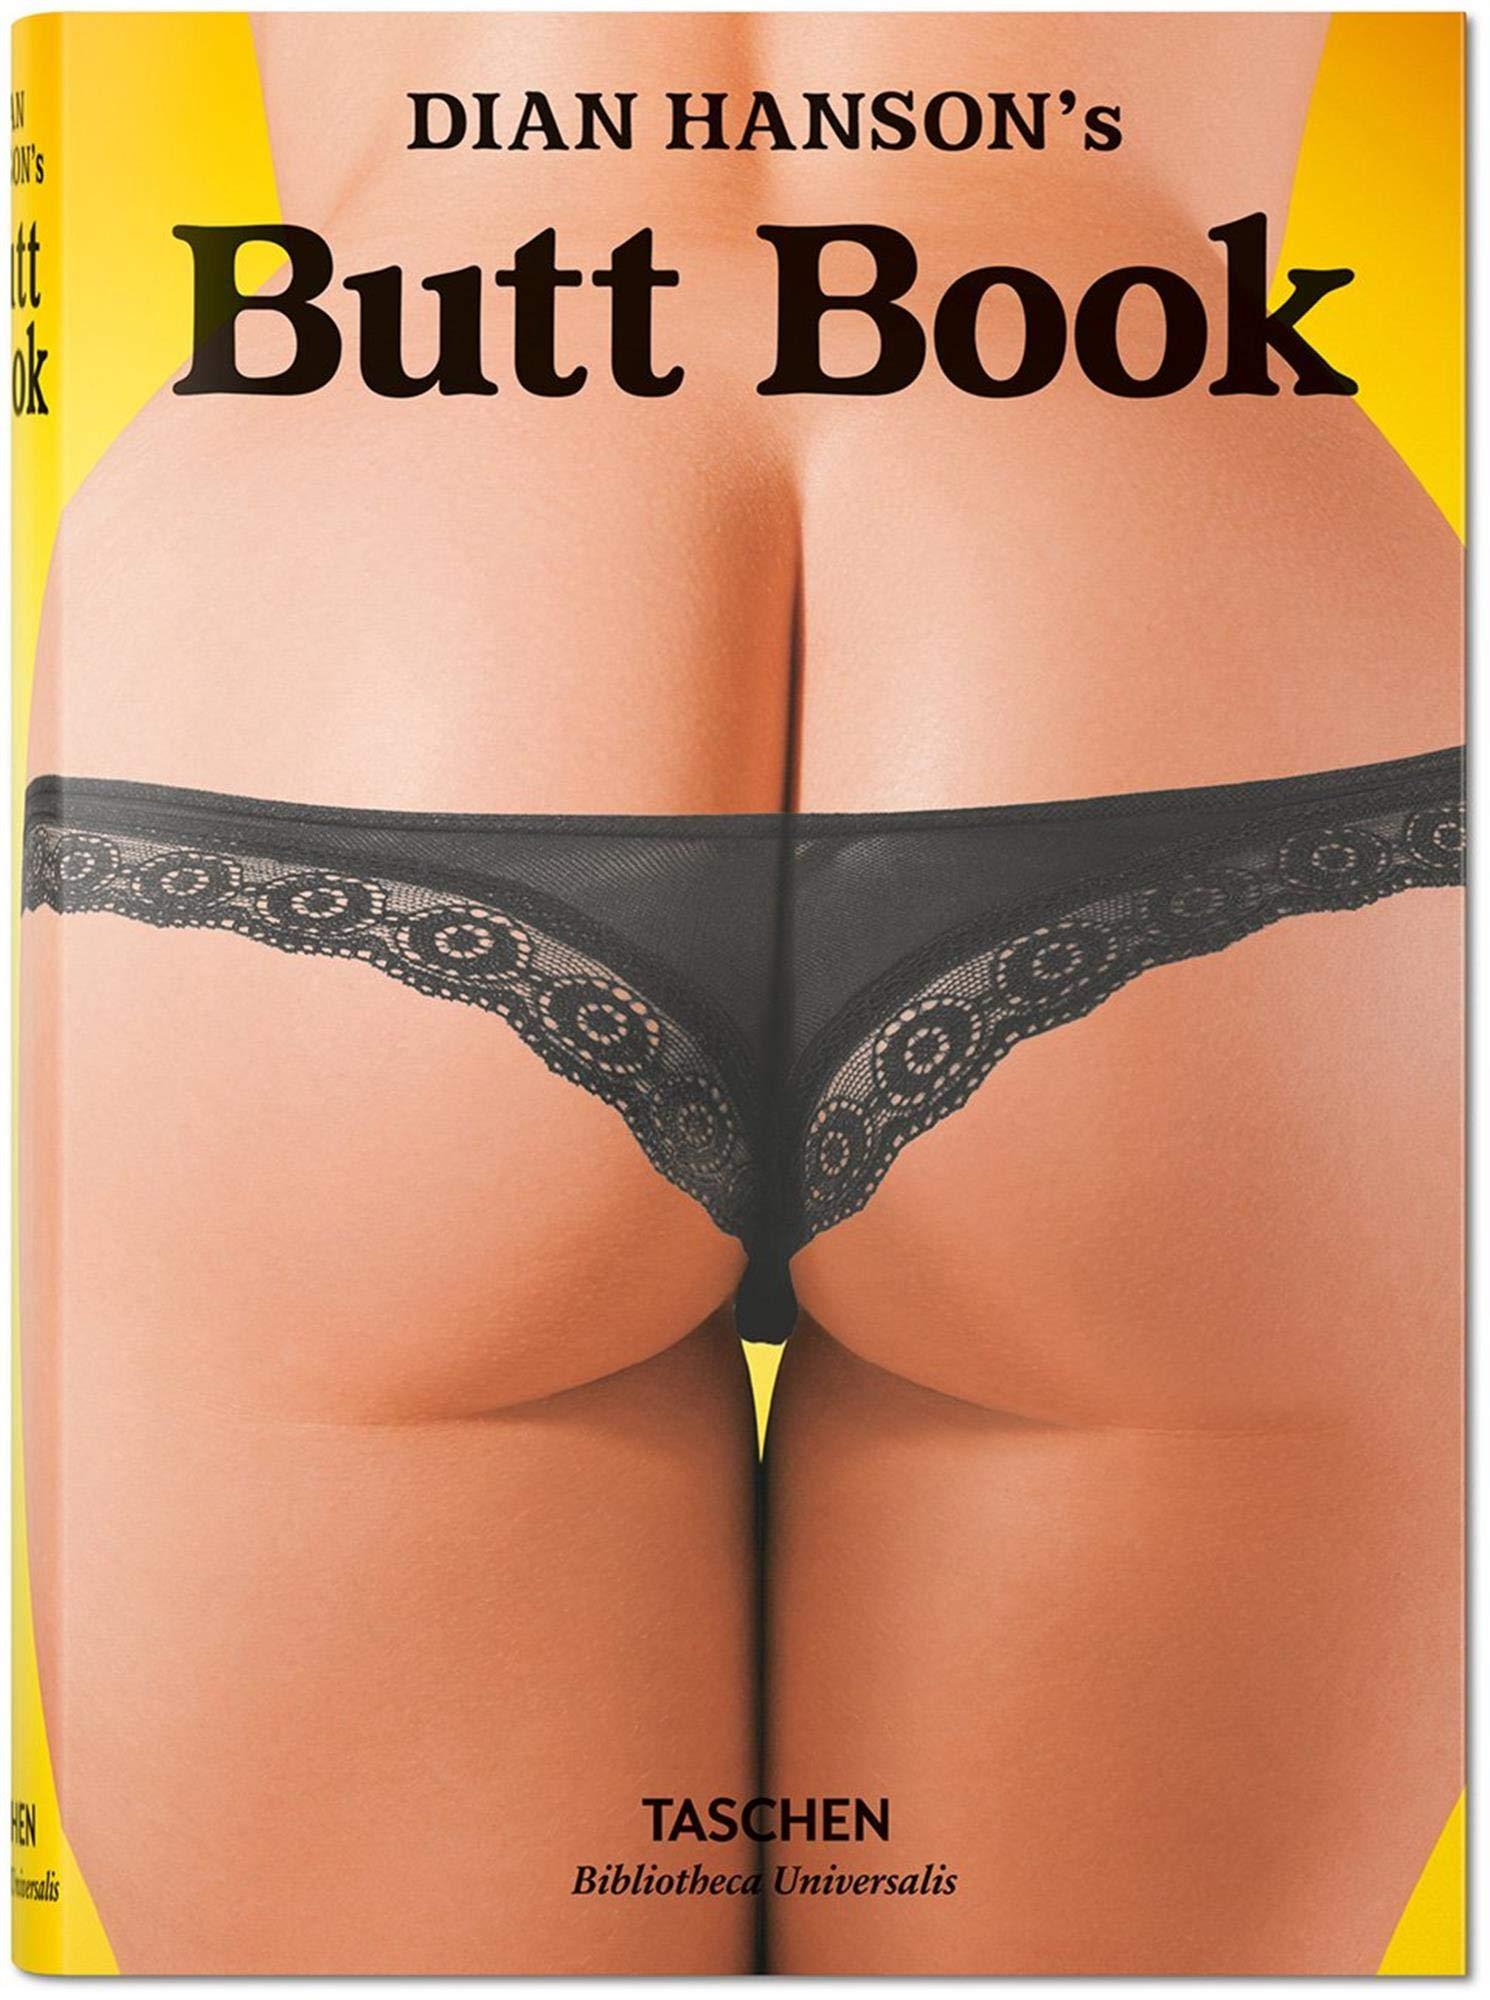 Dian Hanson's Butt Book (Bibliotheca Universalis)